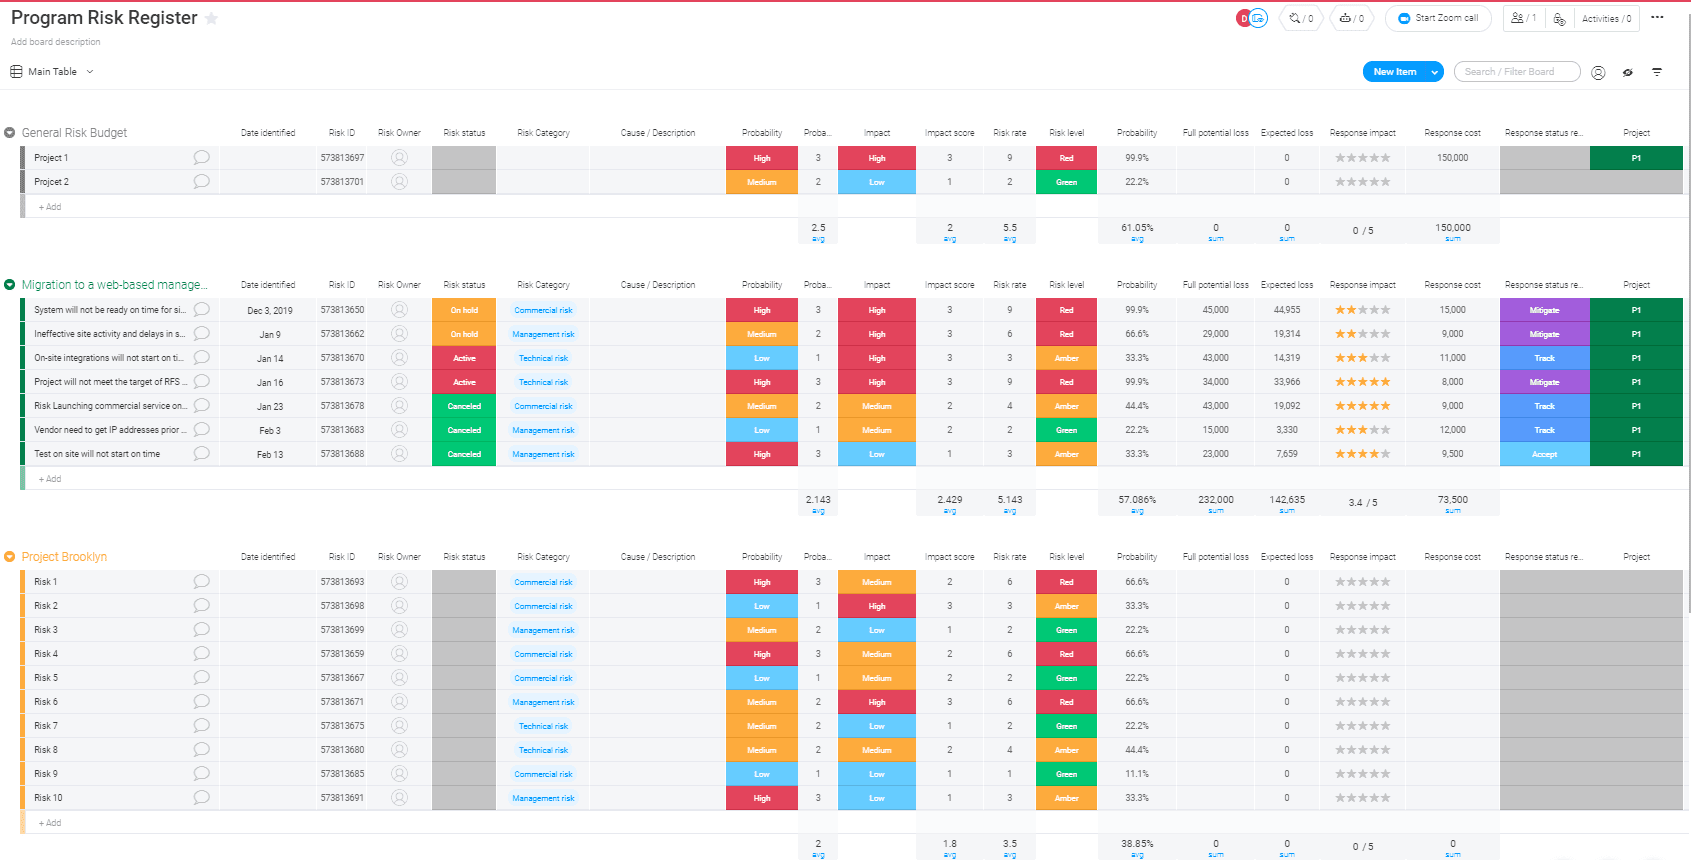 free program risk register template from monday.com